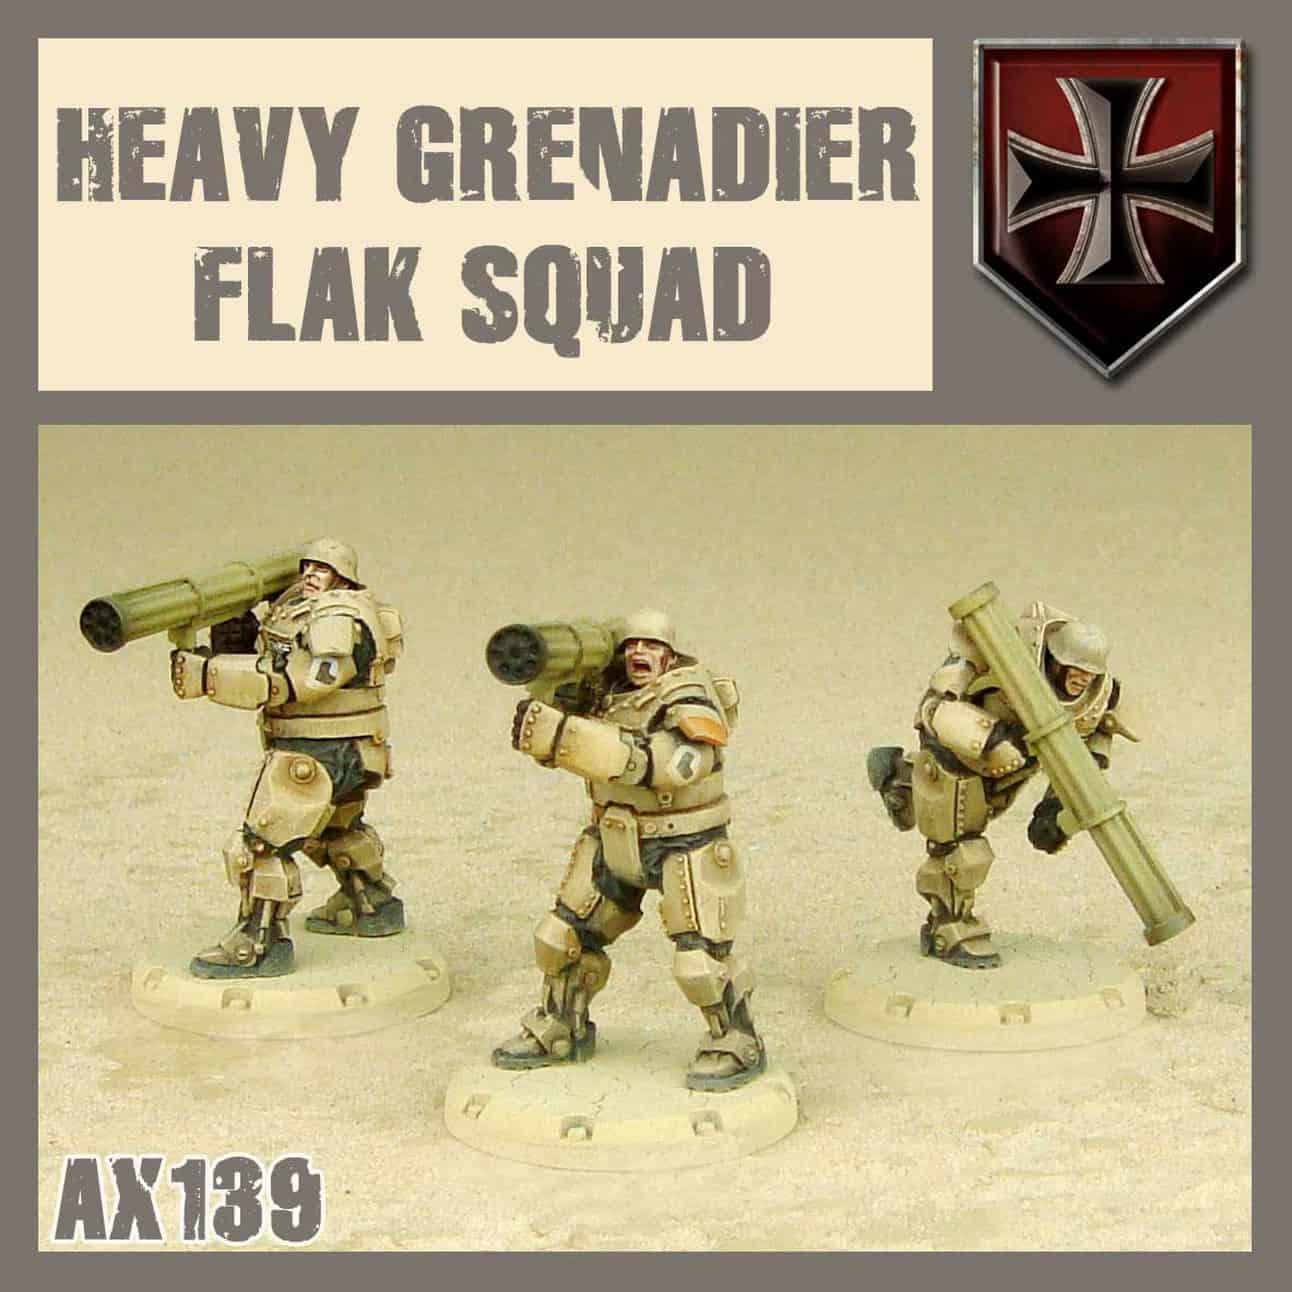 HEAVY GRENADIER FLAK SQUAD